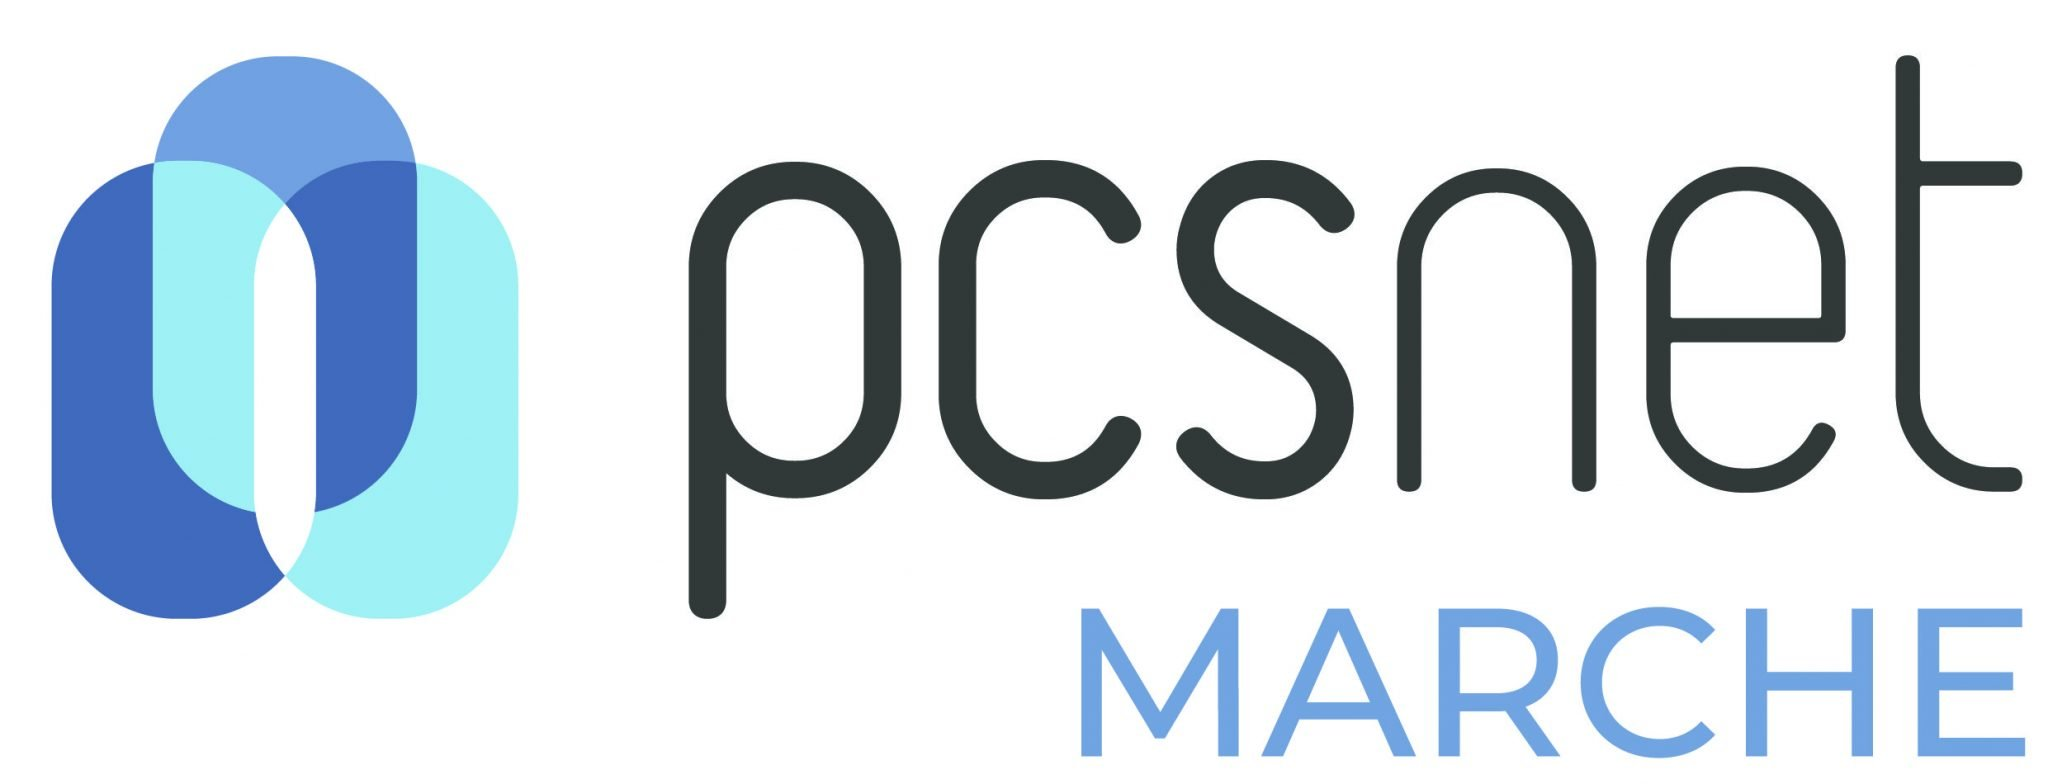 Logo-Pcsnet-Marche-Macerata